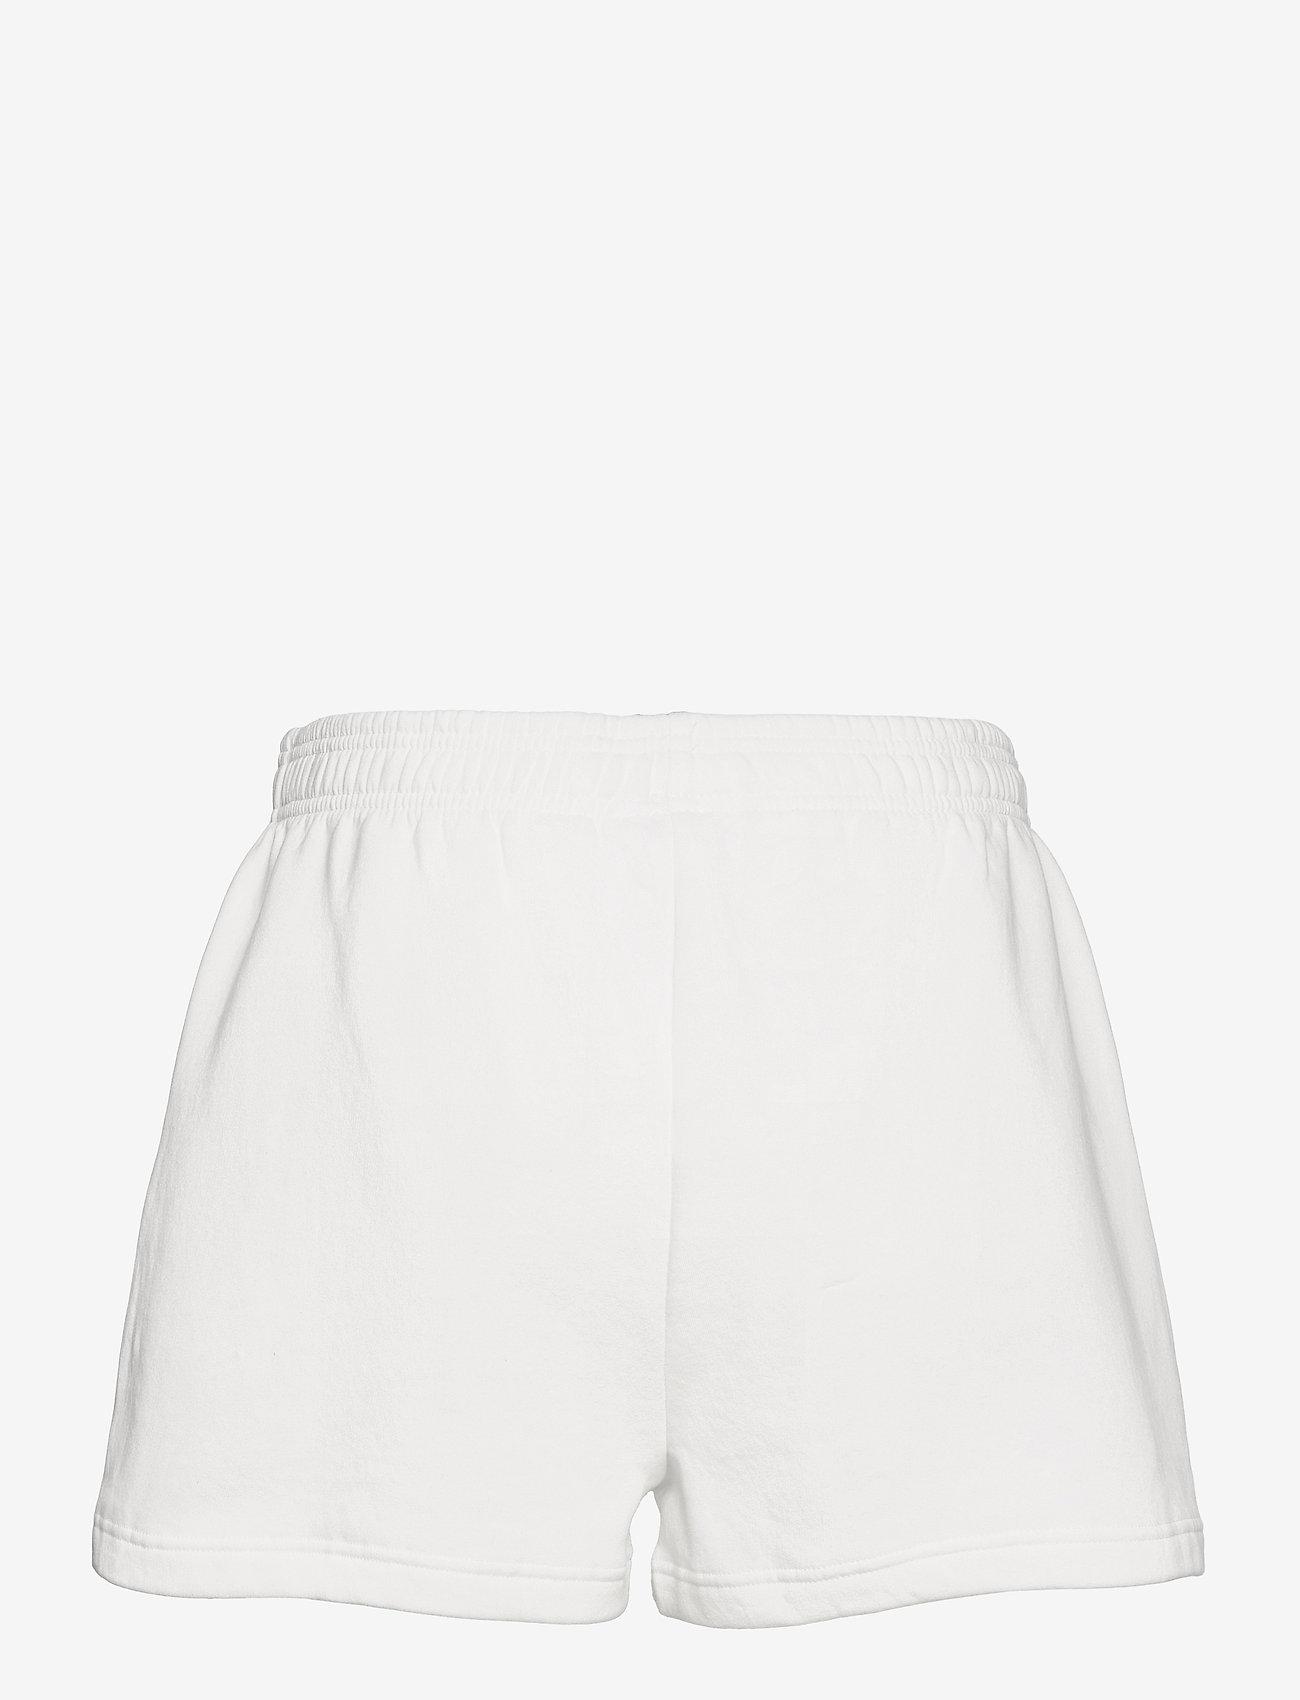 Gina Tricot - Gia shorts - shorts casual - offwhite - 1